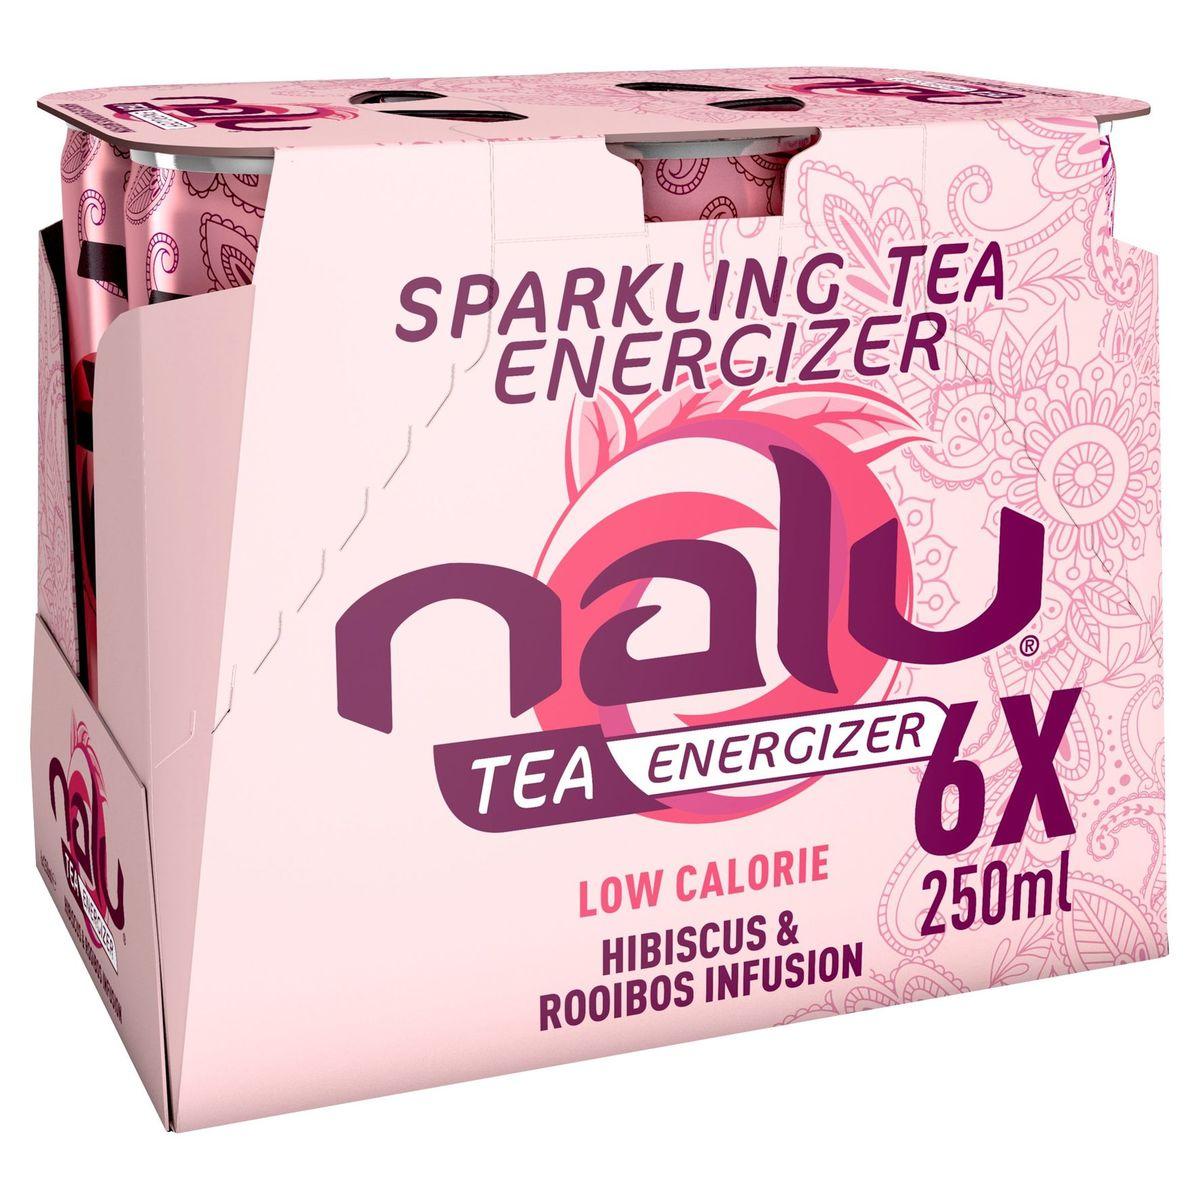 Nalu Tea Hibiscus & Rooibos Infusion Canette 6 x 250 ml